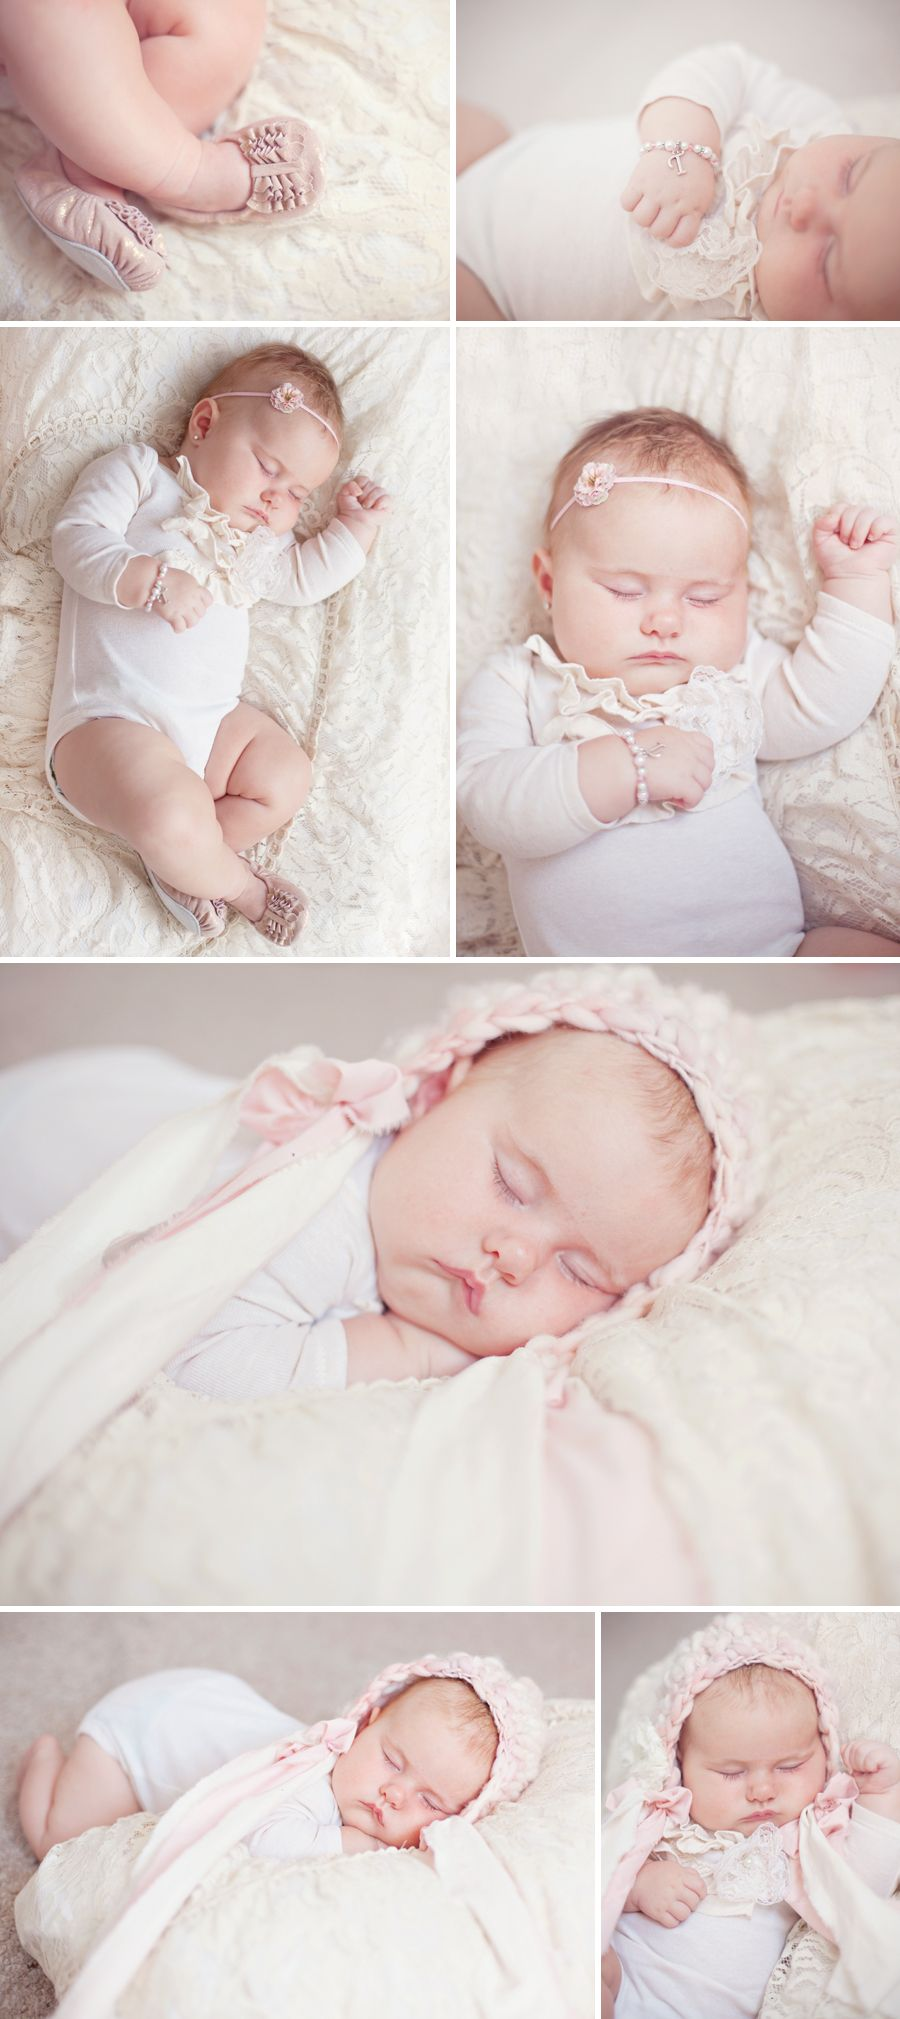 Rachel Absher's beautiful little babe <3